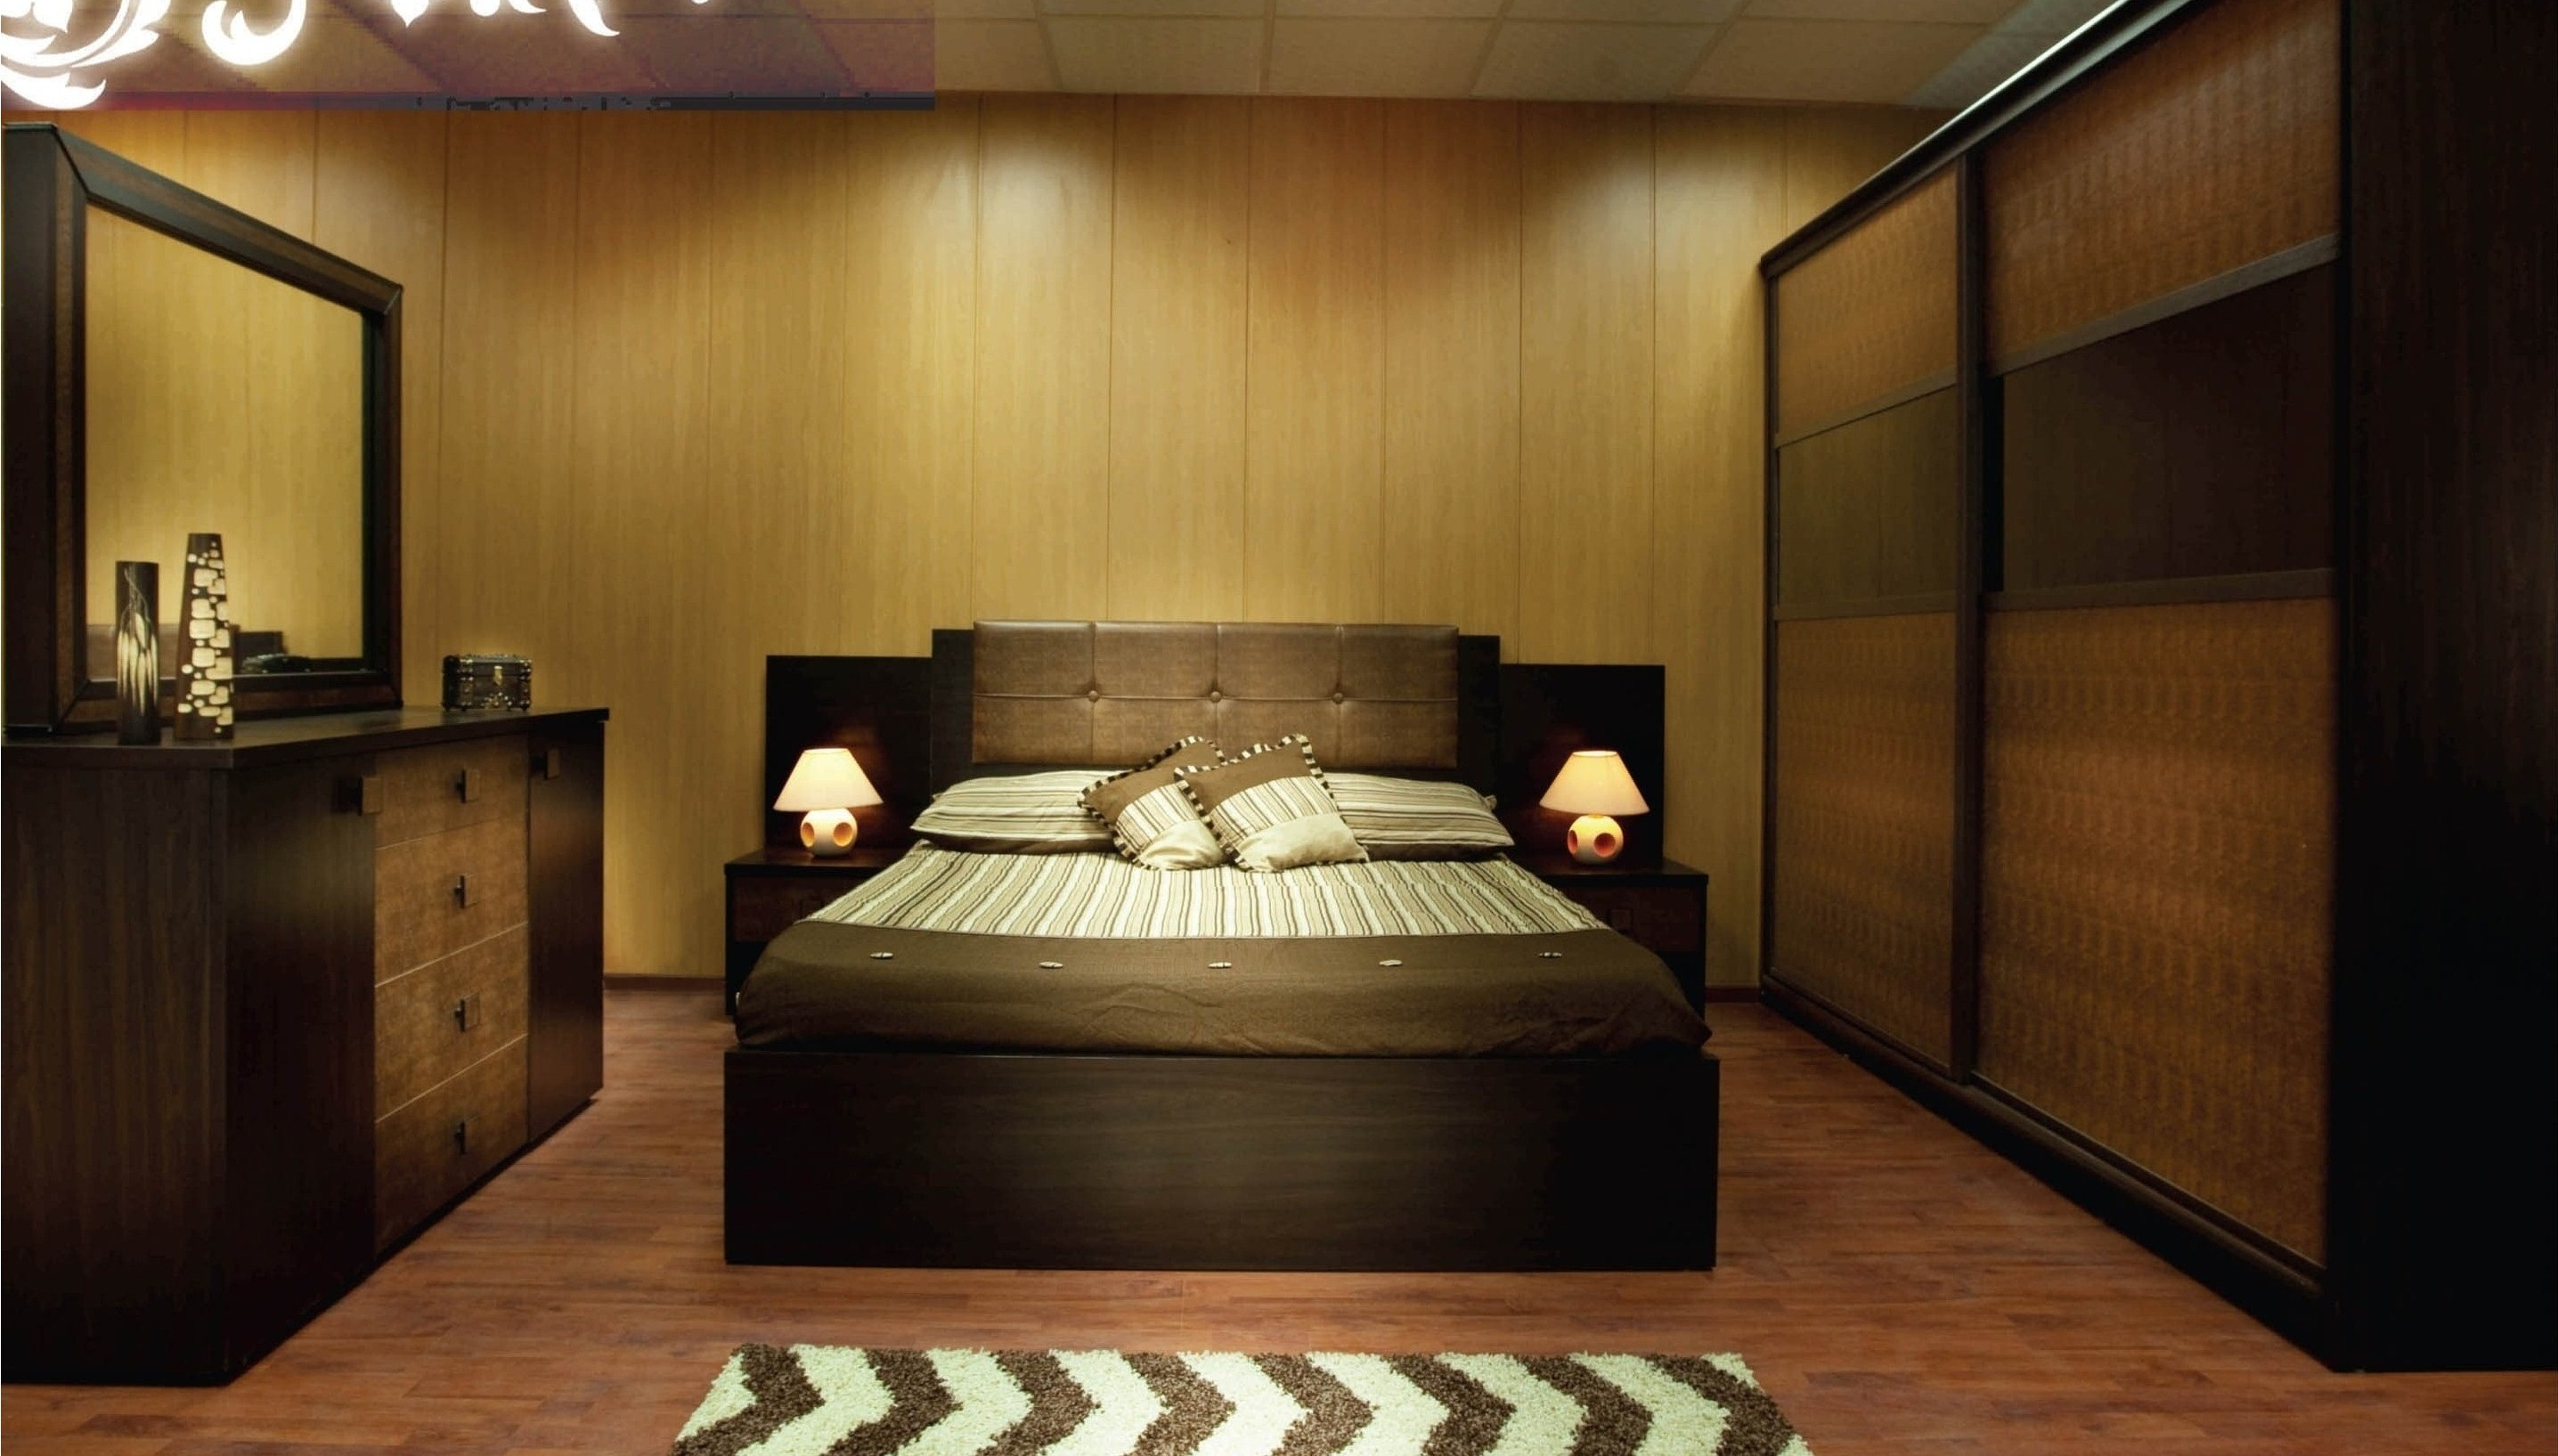 بالصور اجمل ديكورات غرف النوم , صور لغرف نوم ذي ديكور متميز 2624 5